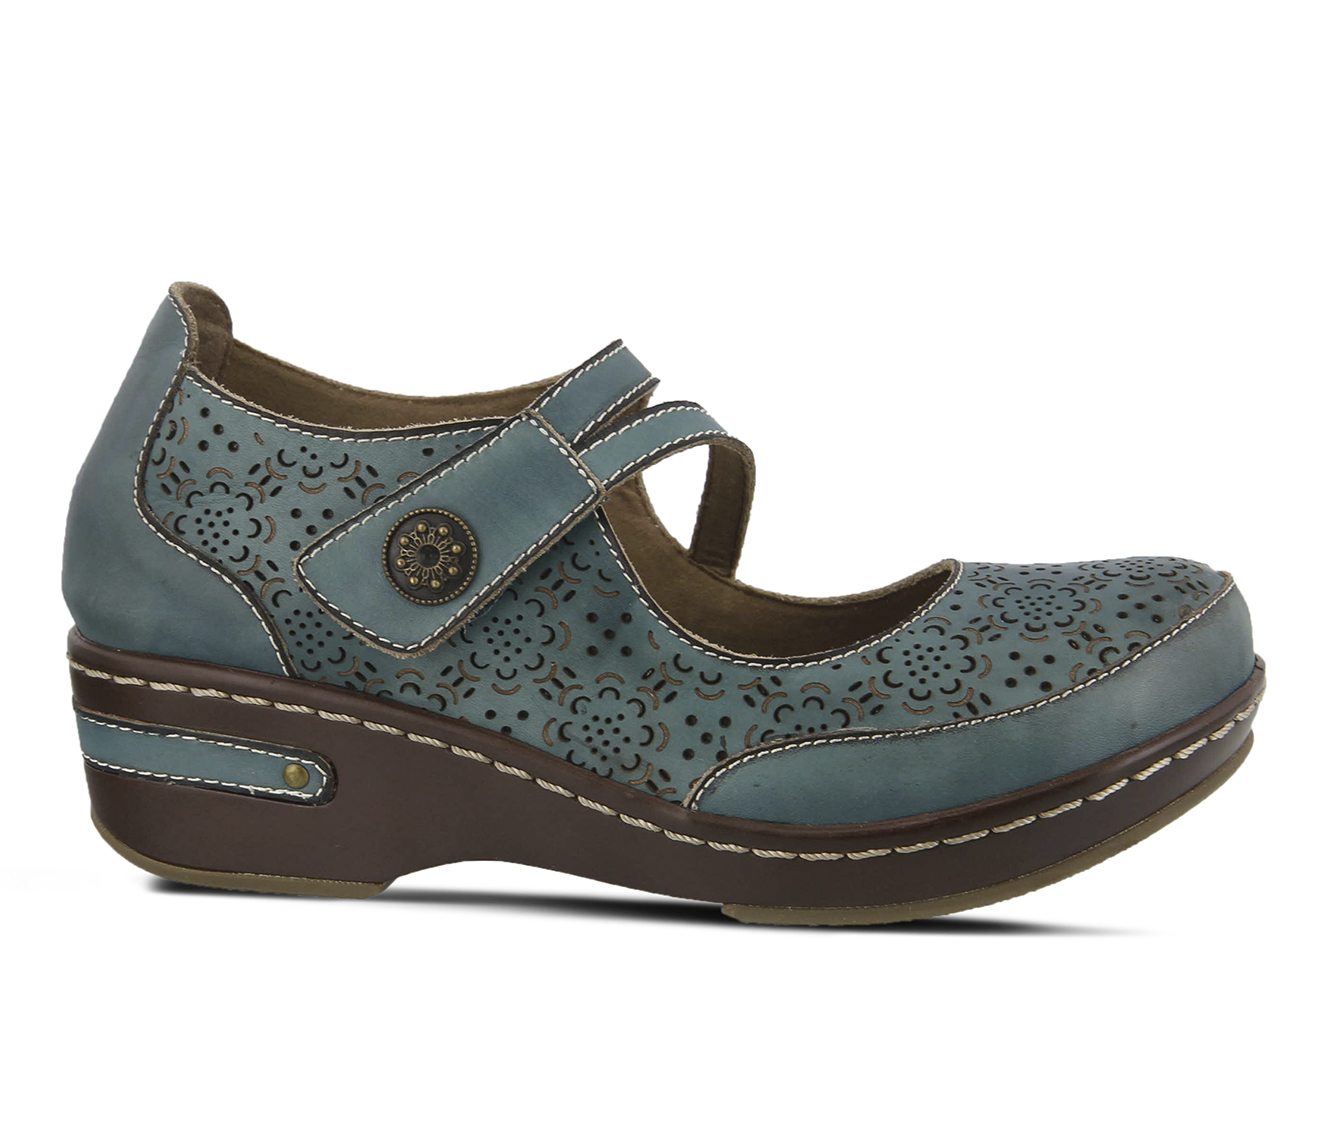 L'Artiste Mamata Women's Shoe (Blue Leather)